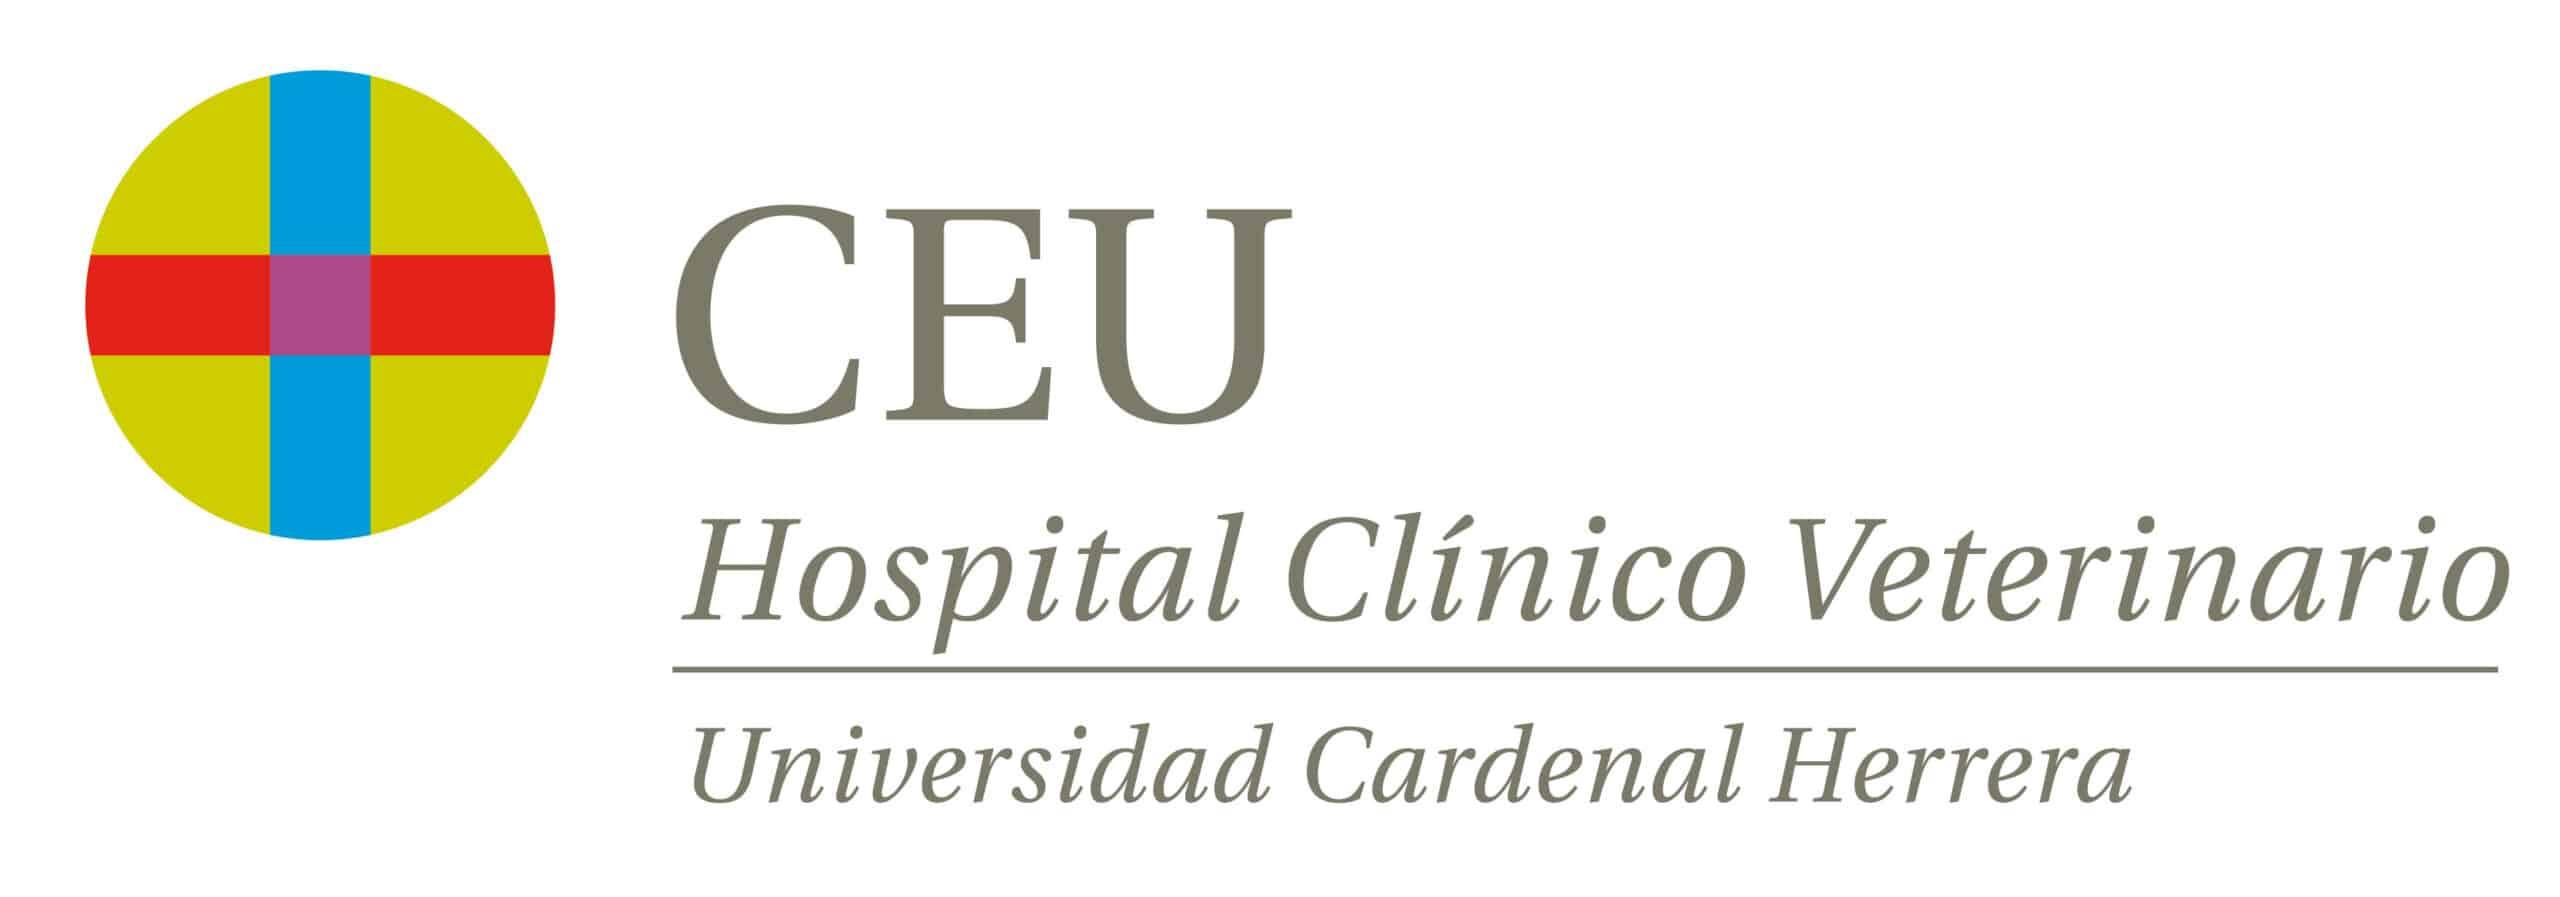 Hospital_Clinico_Veterinario_CEU_Cardenal_Herrera